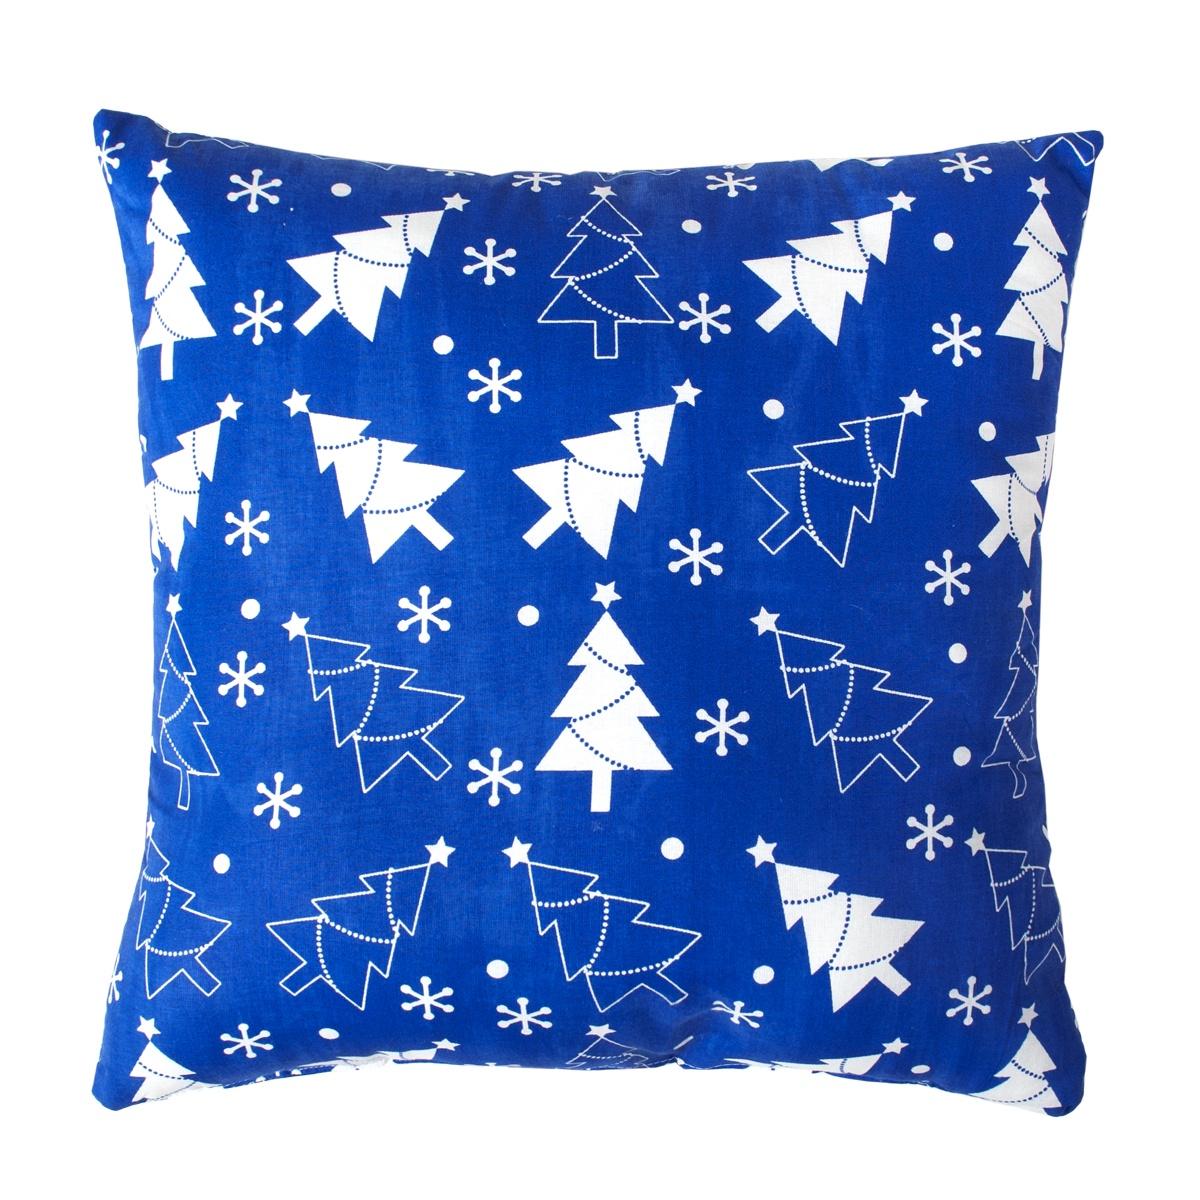 Подушка декоративная Традиция Новый год 2059, синий, 40x40 см цена